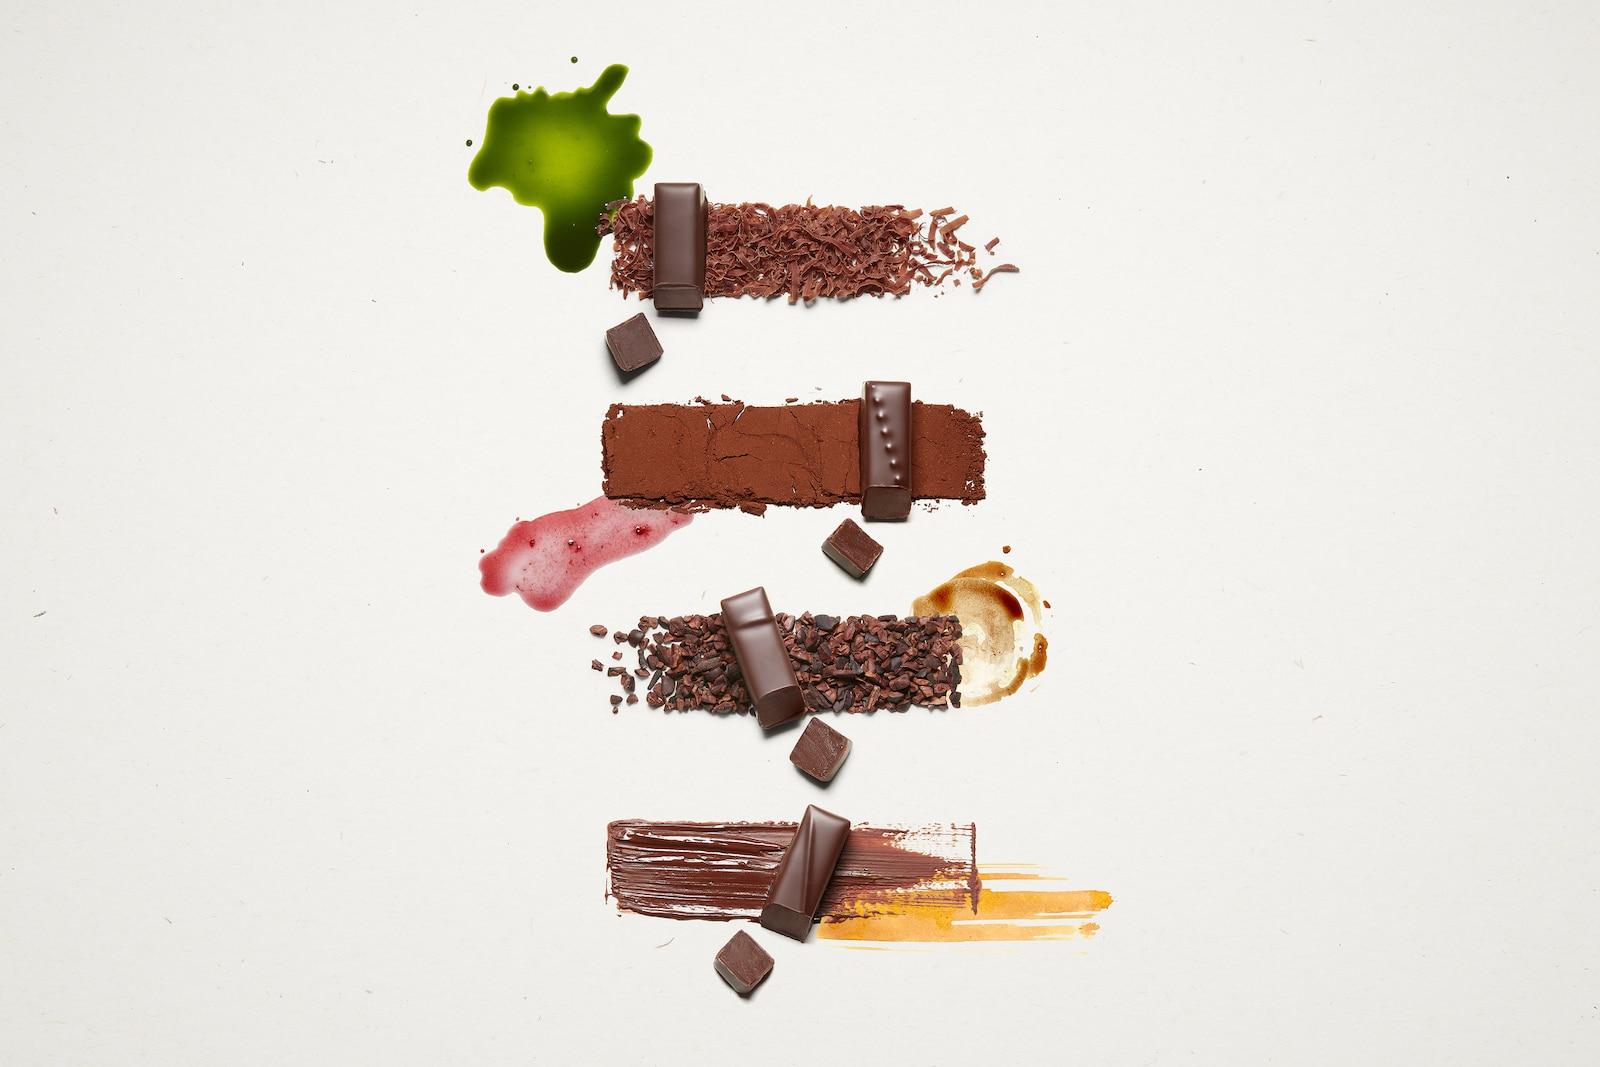 Ganaches vegan La Maison du Chocolat